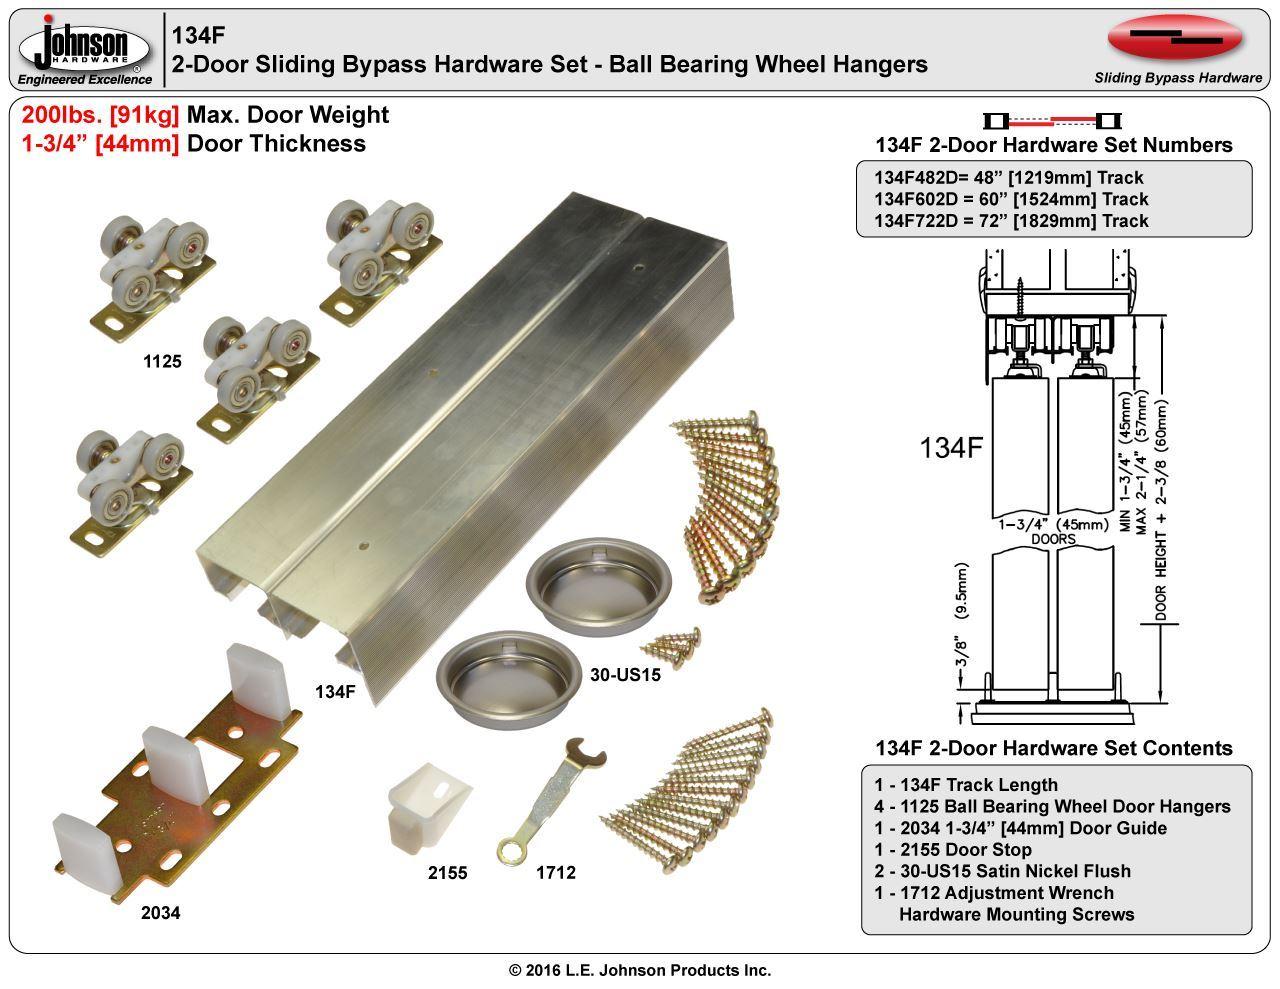 60 2 Door System 134F Sliding Bypass Door Hardware